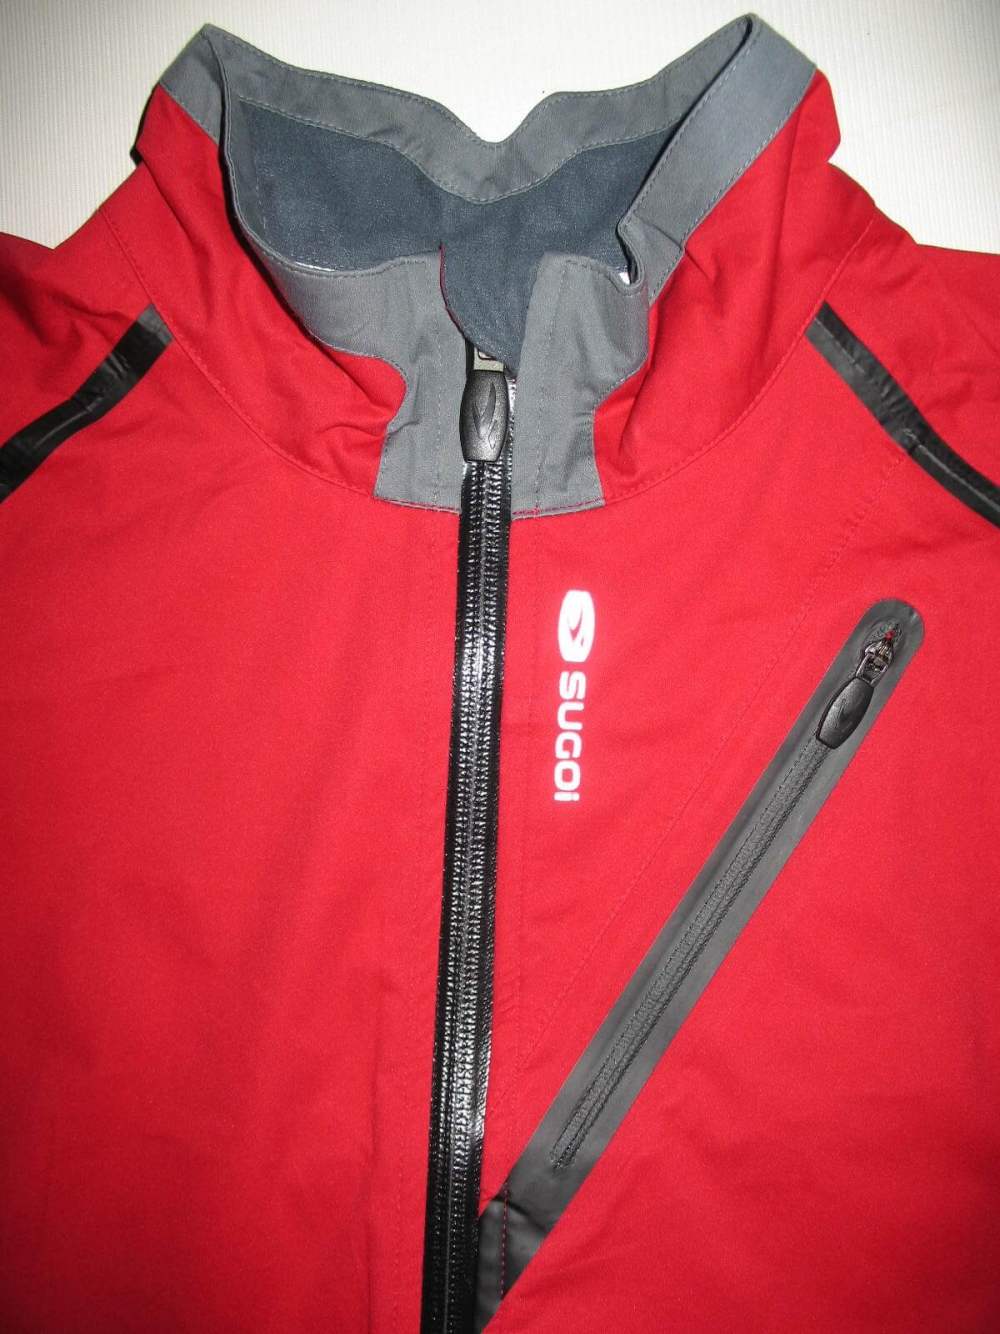 Куртка SUGOI waterproof light bike/run jacket (размер M) - 2